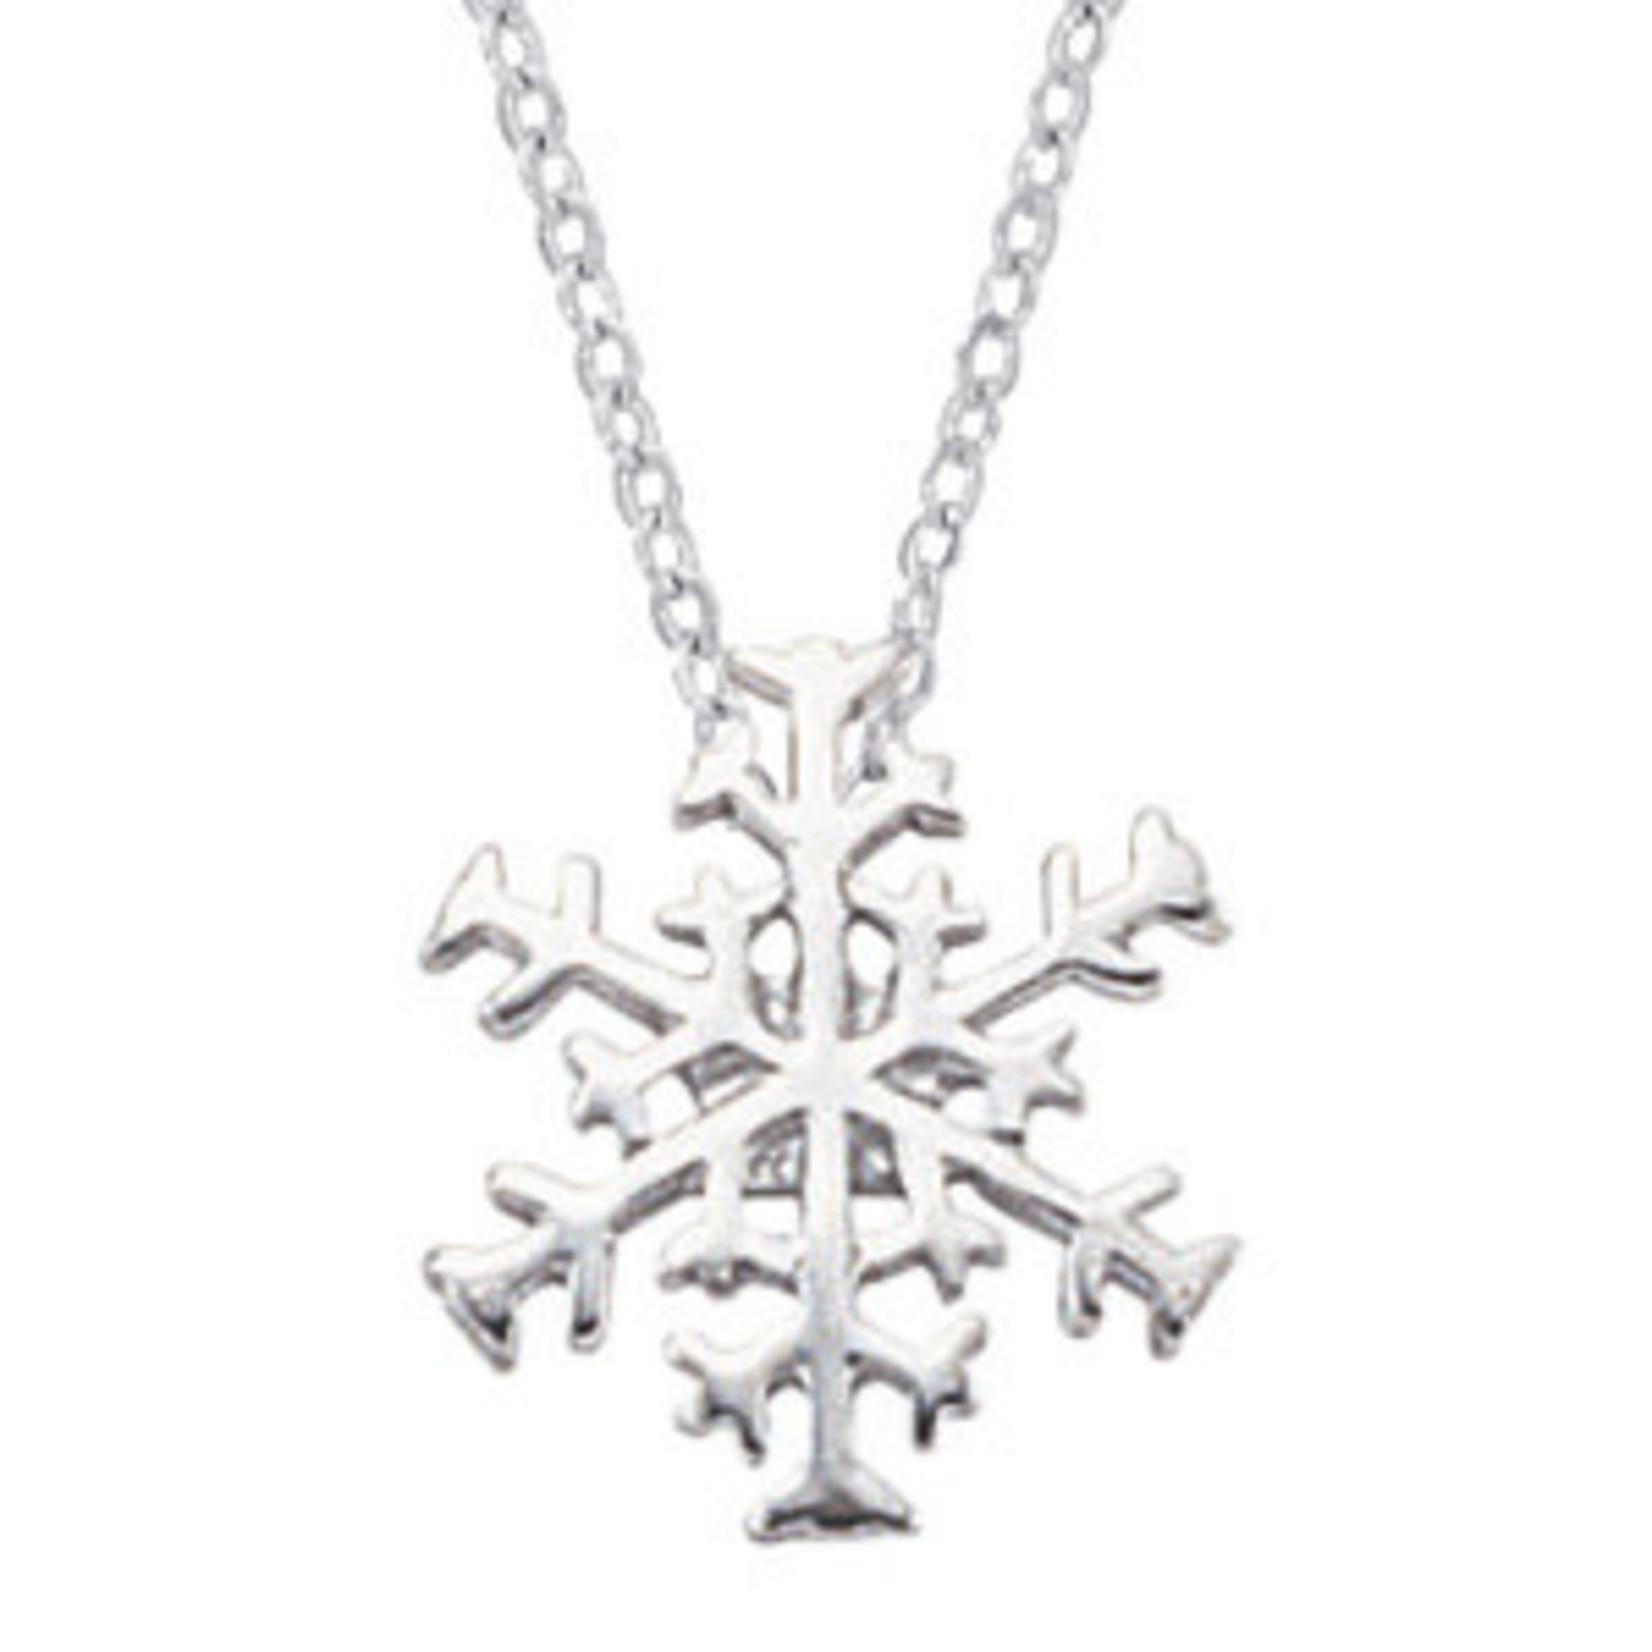 Silver Snowflake Pendant 16-18in Chain